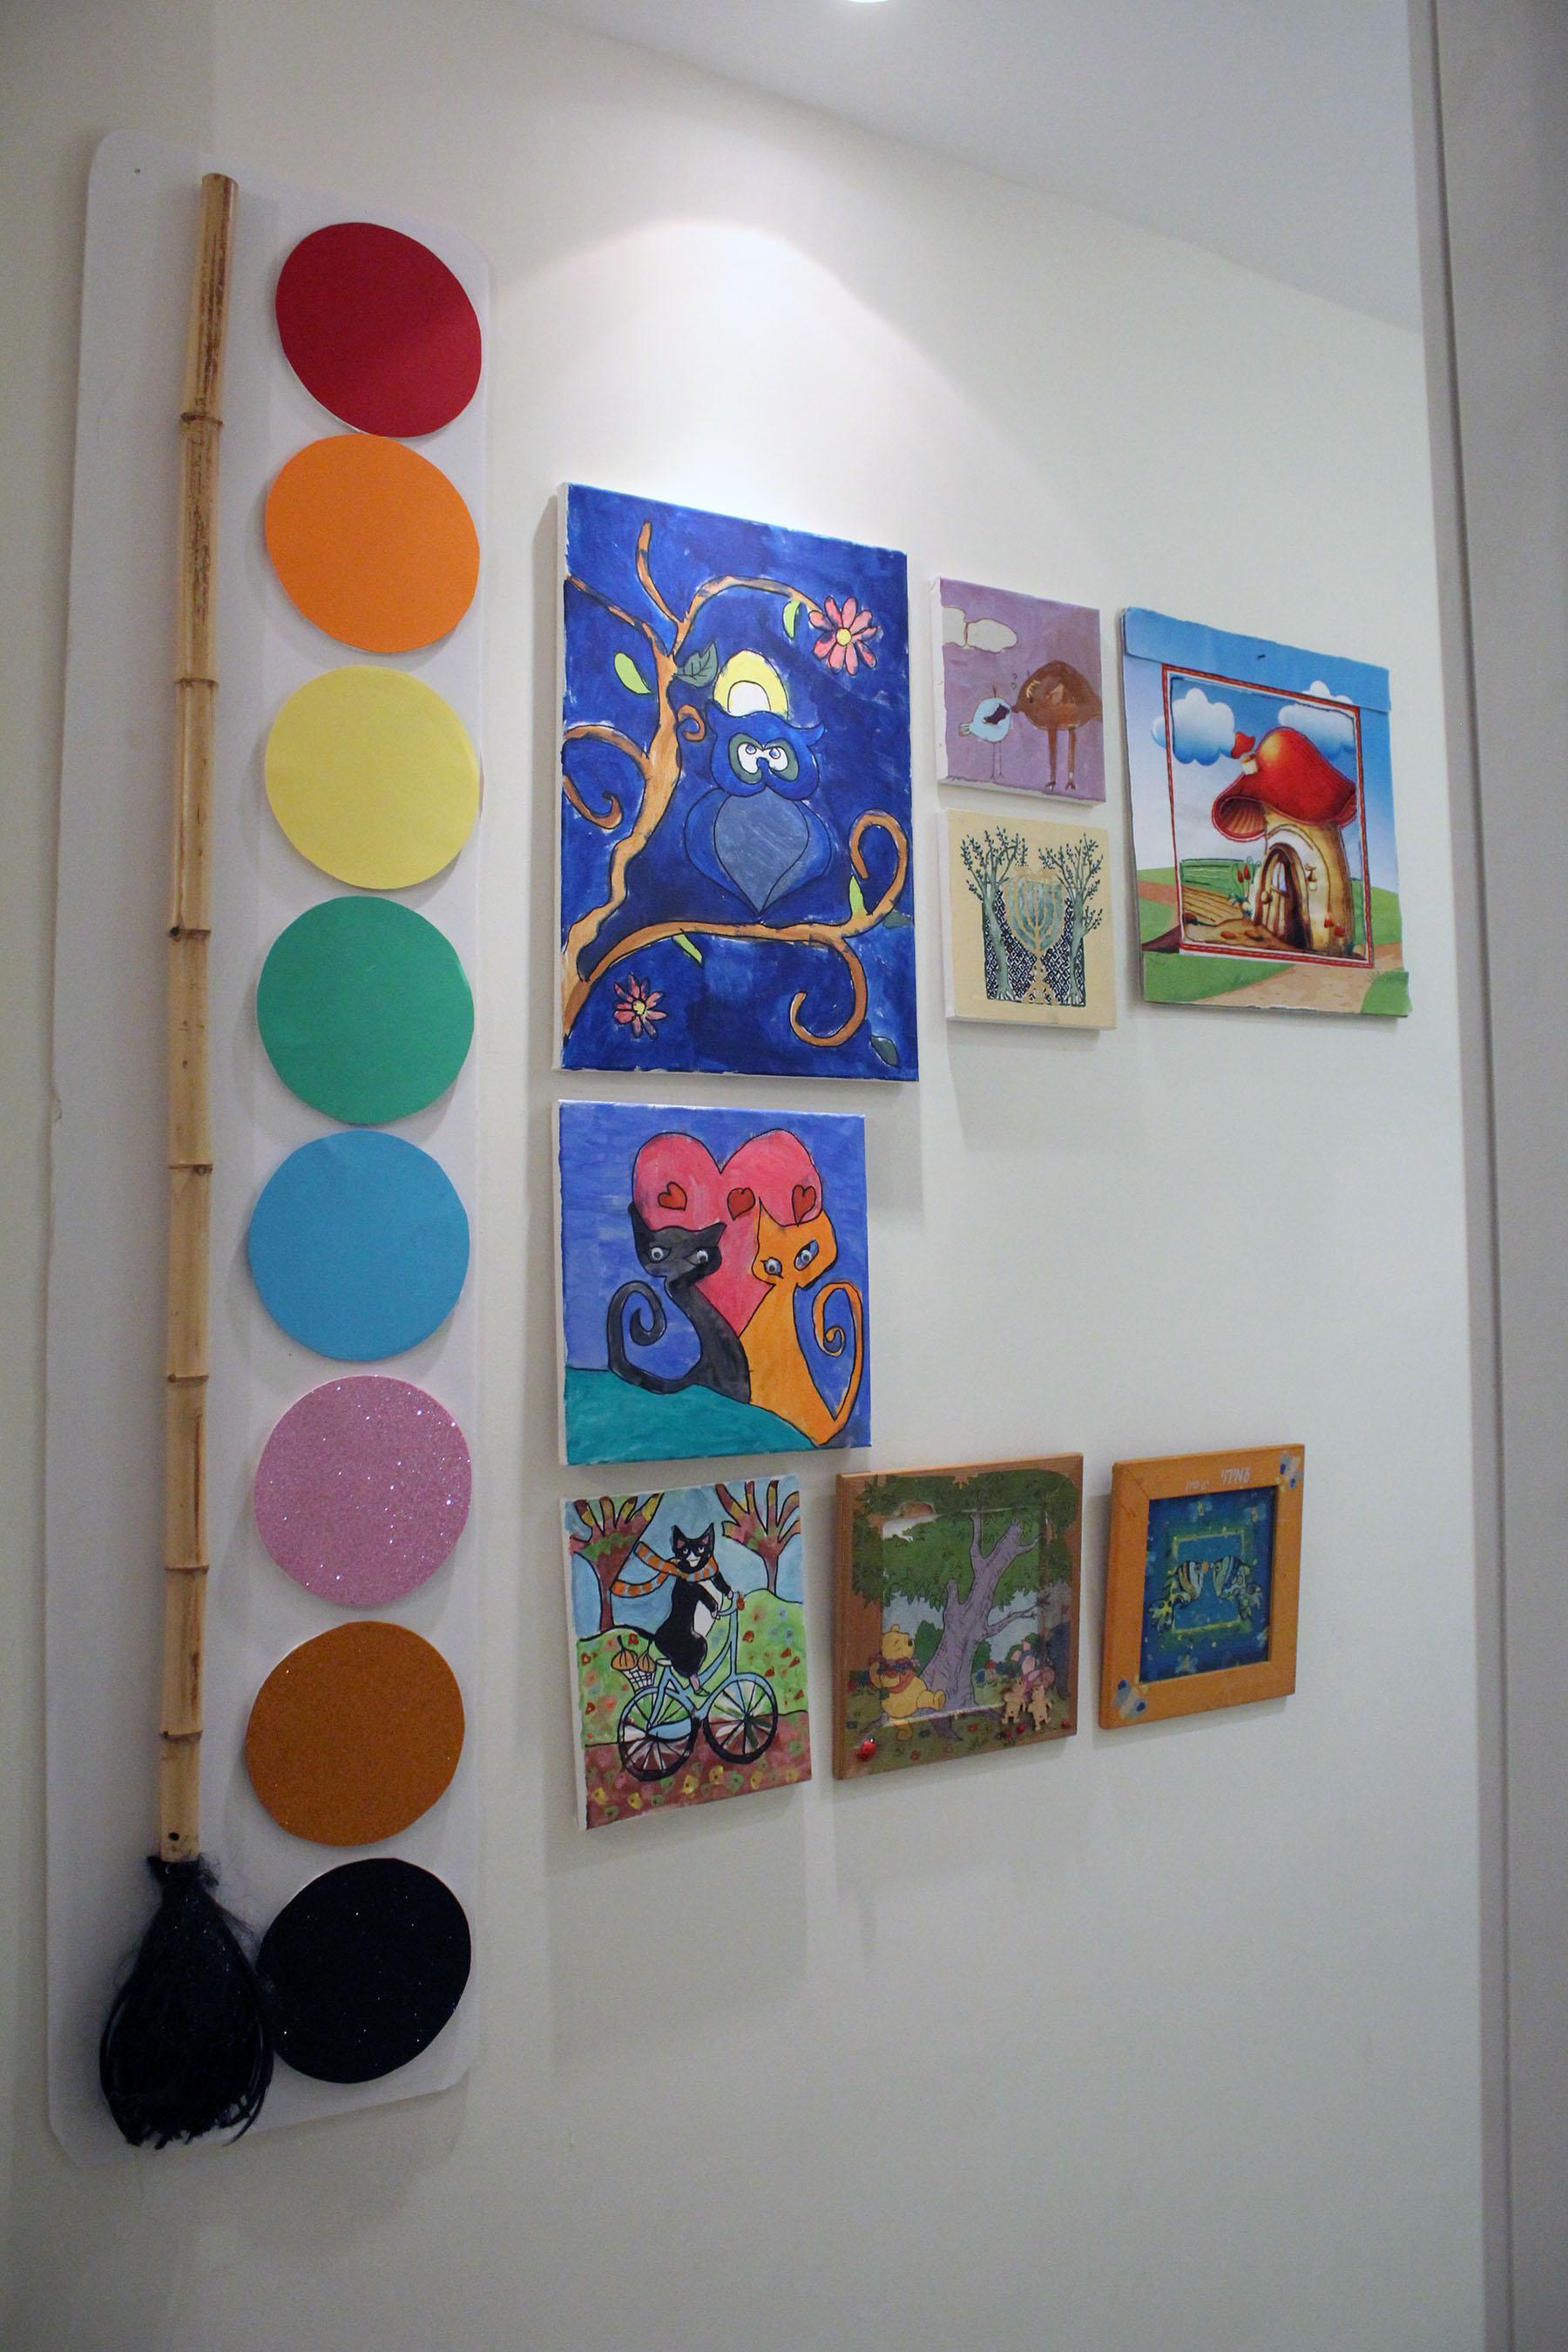 IMG 9972 - חלומות בסטודיו